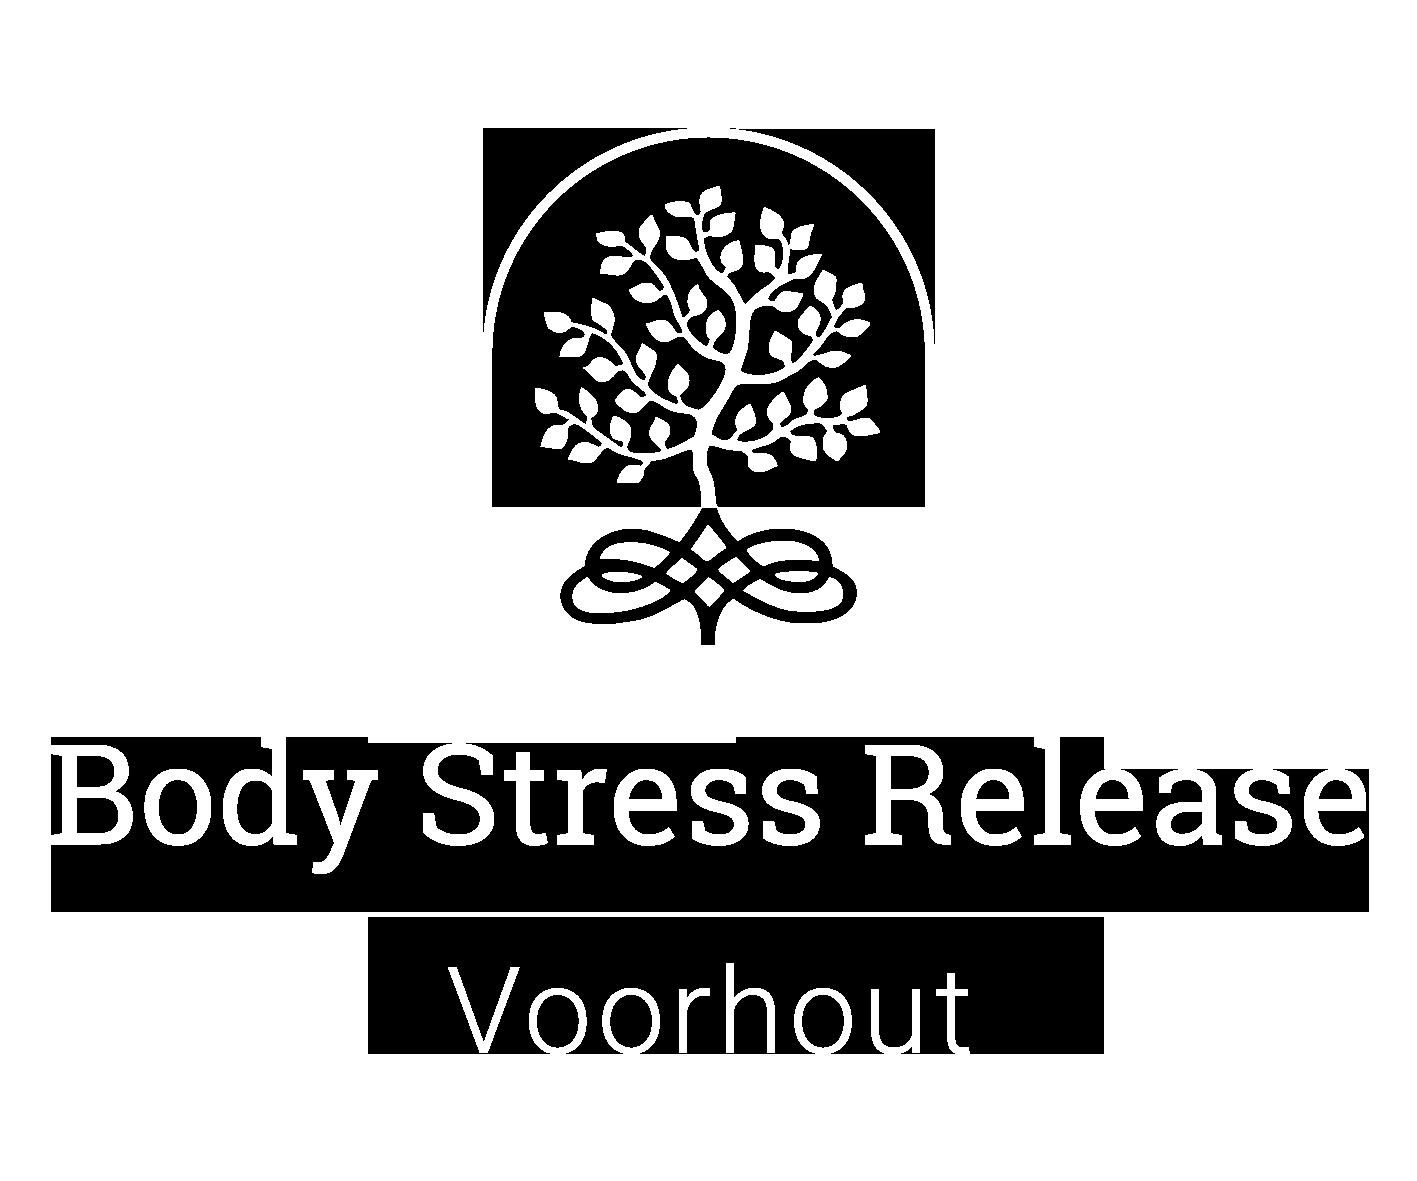 bsr-voorhout.nl logo